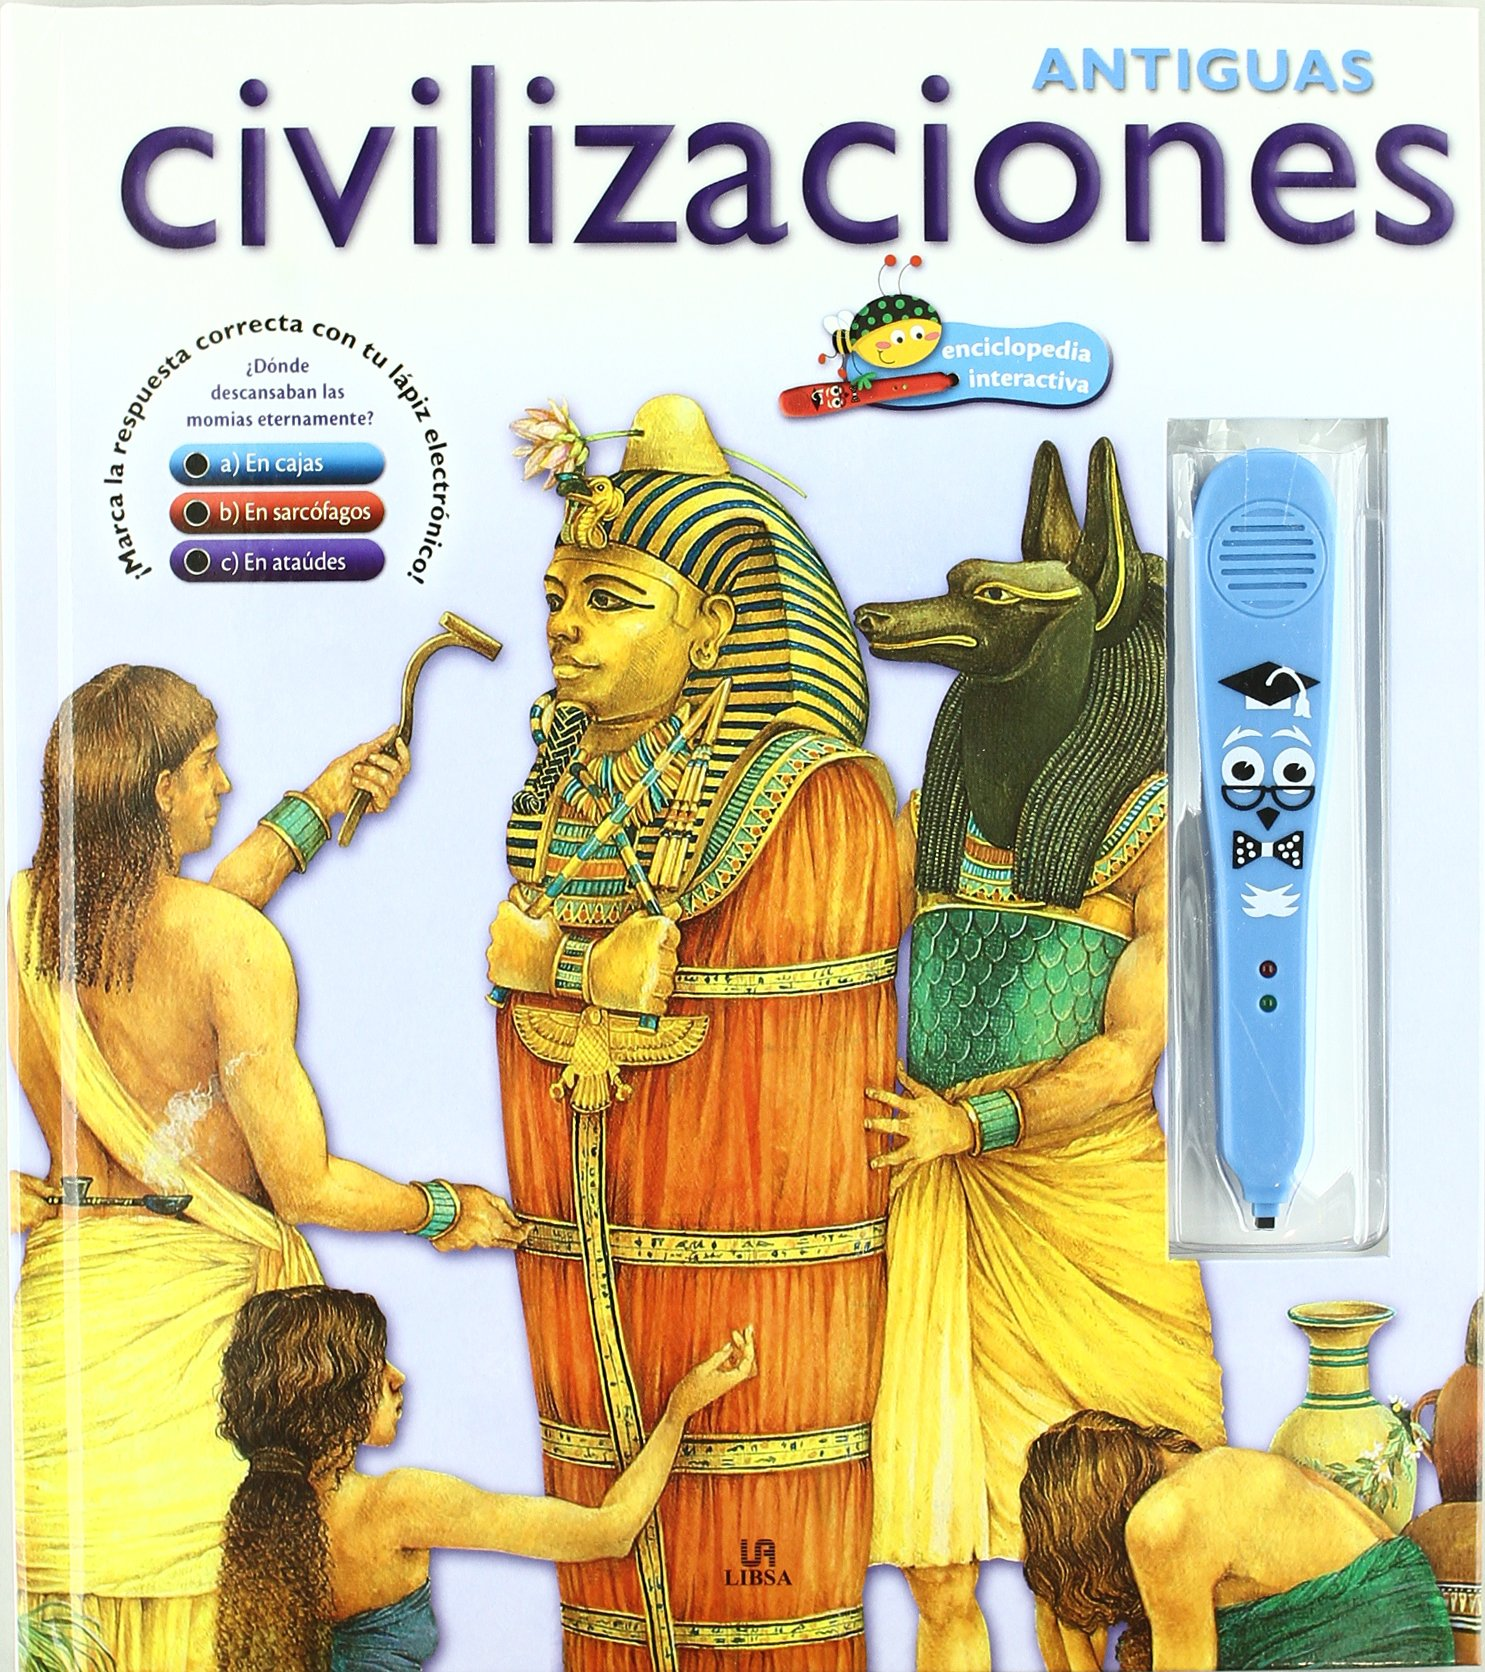 Antiguas civilizaciones / Ancient Worlds (Spanish Edition) (Spanish) Hardcover – May 30, 2011